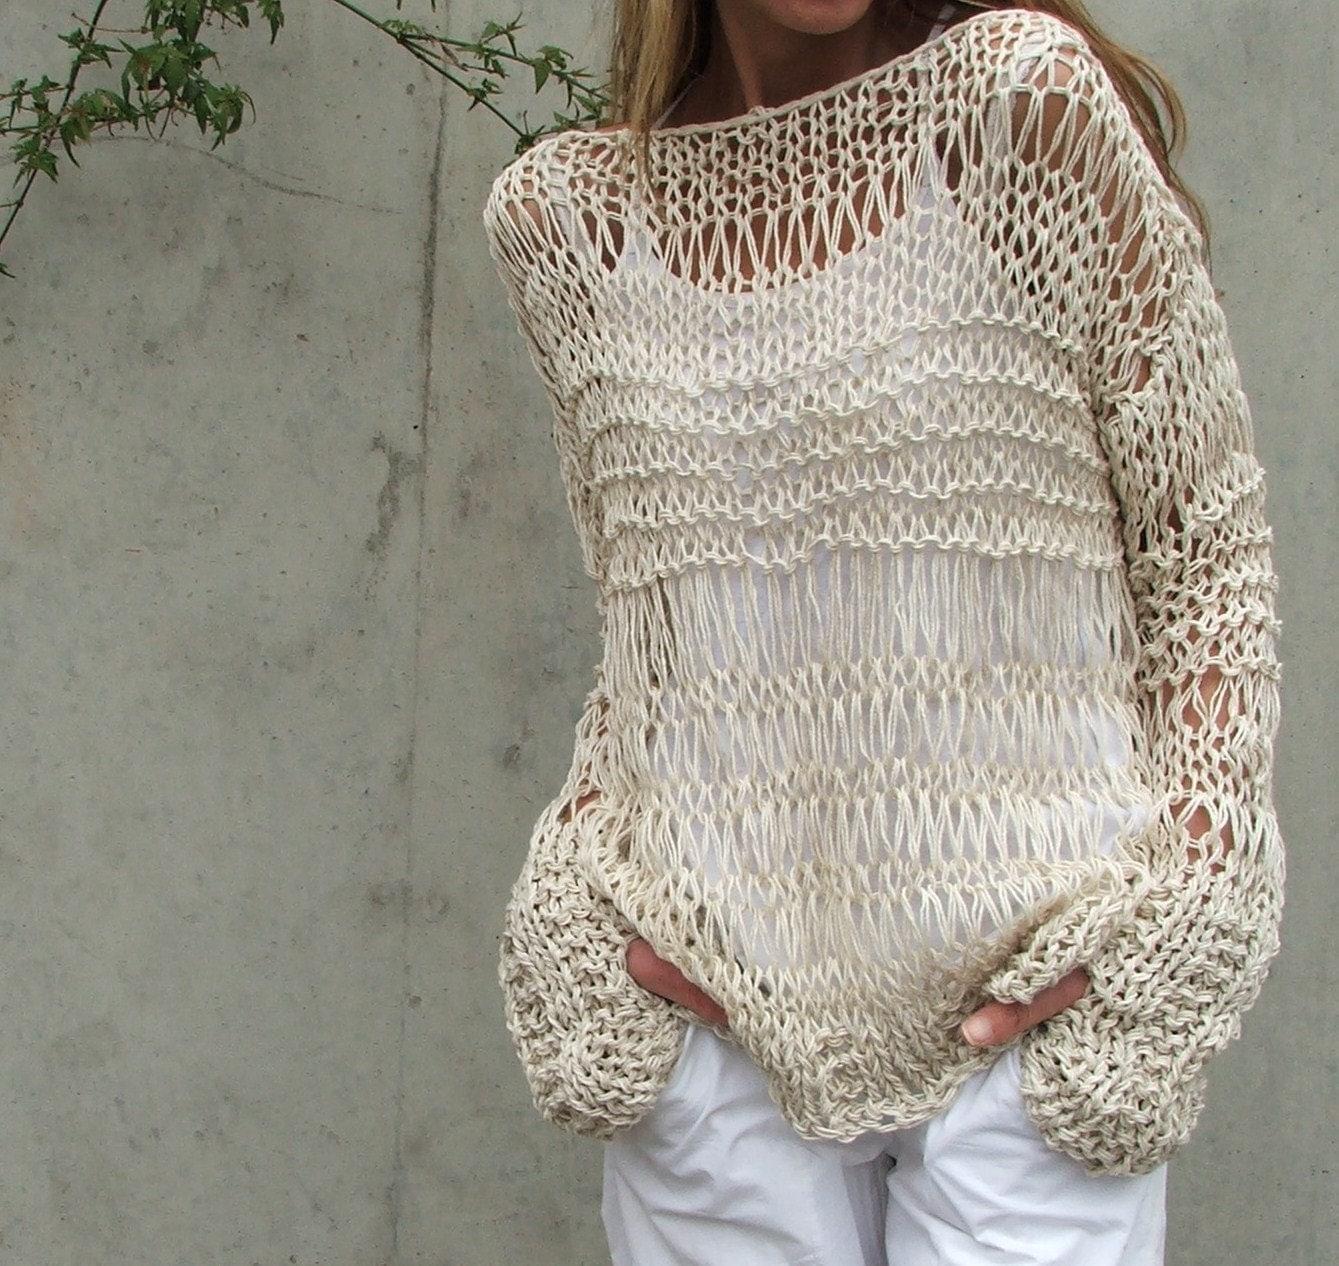 Knitting Summer Sweater Patterns : Chandeliers pendant lights